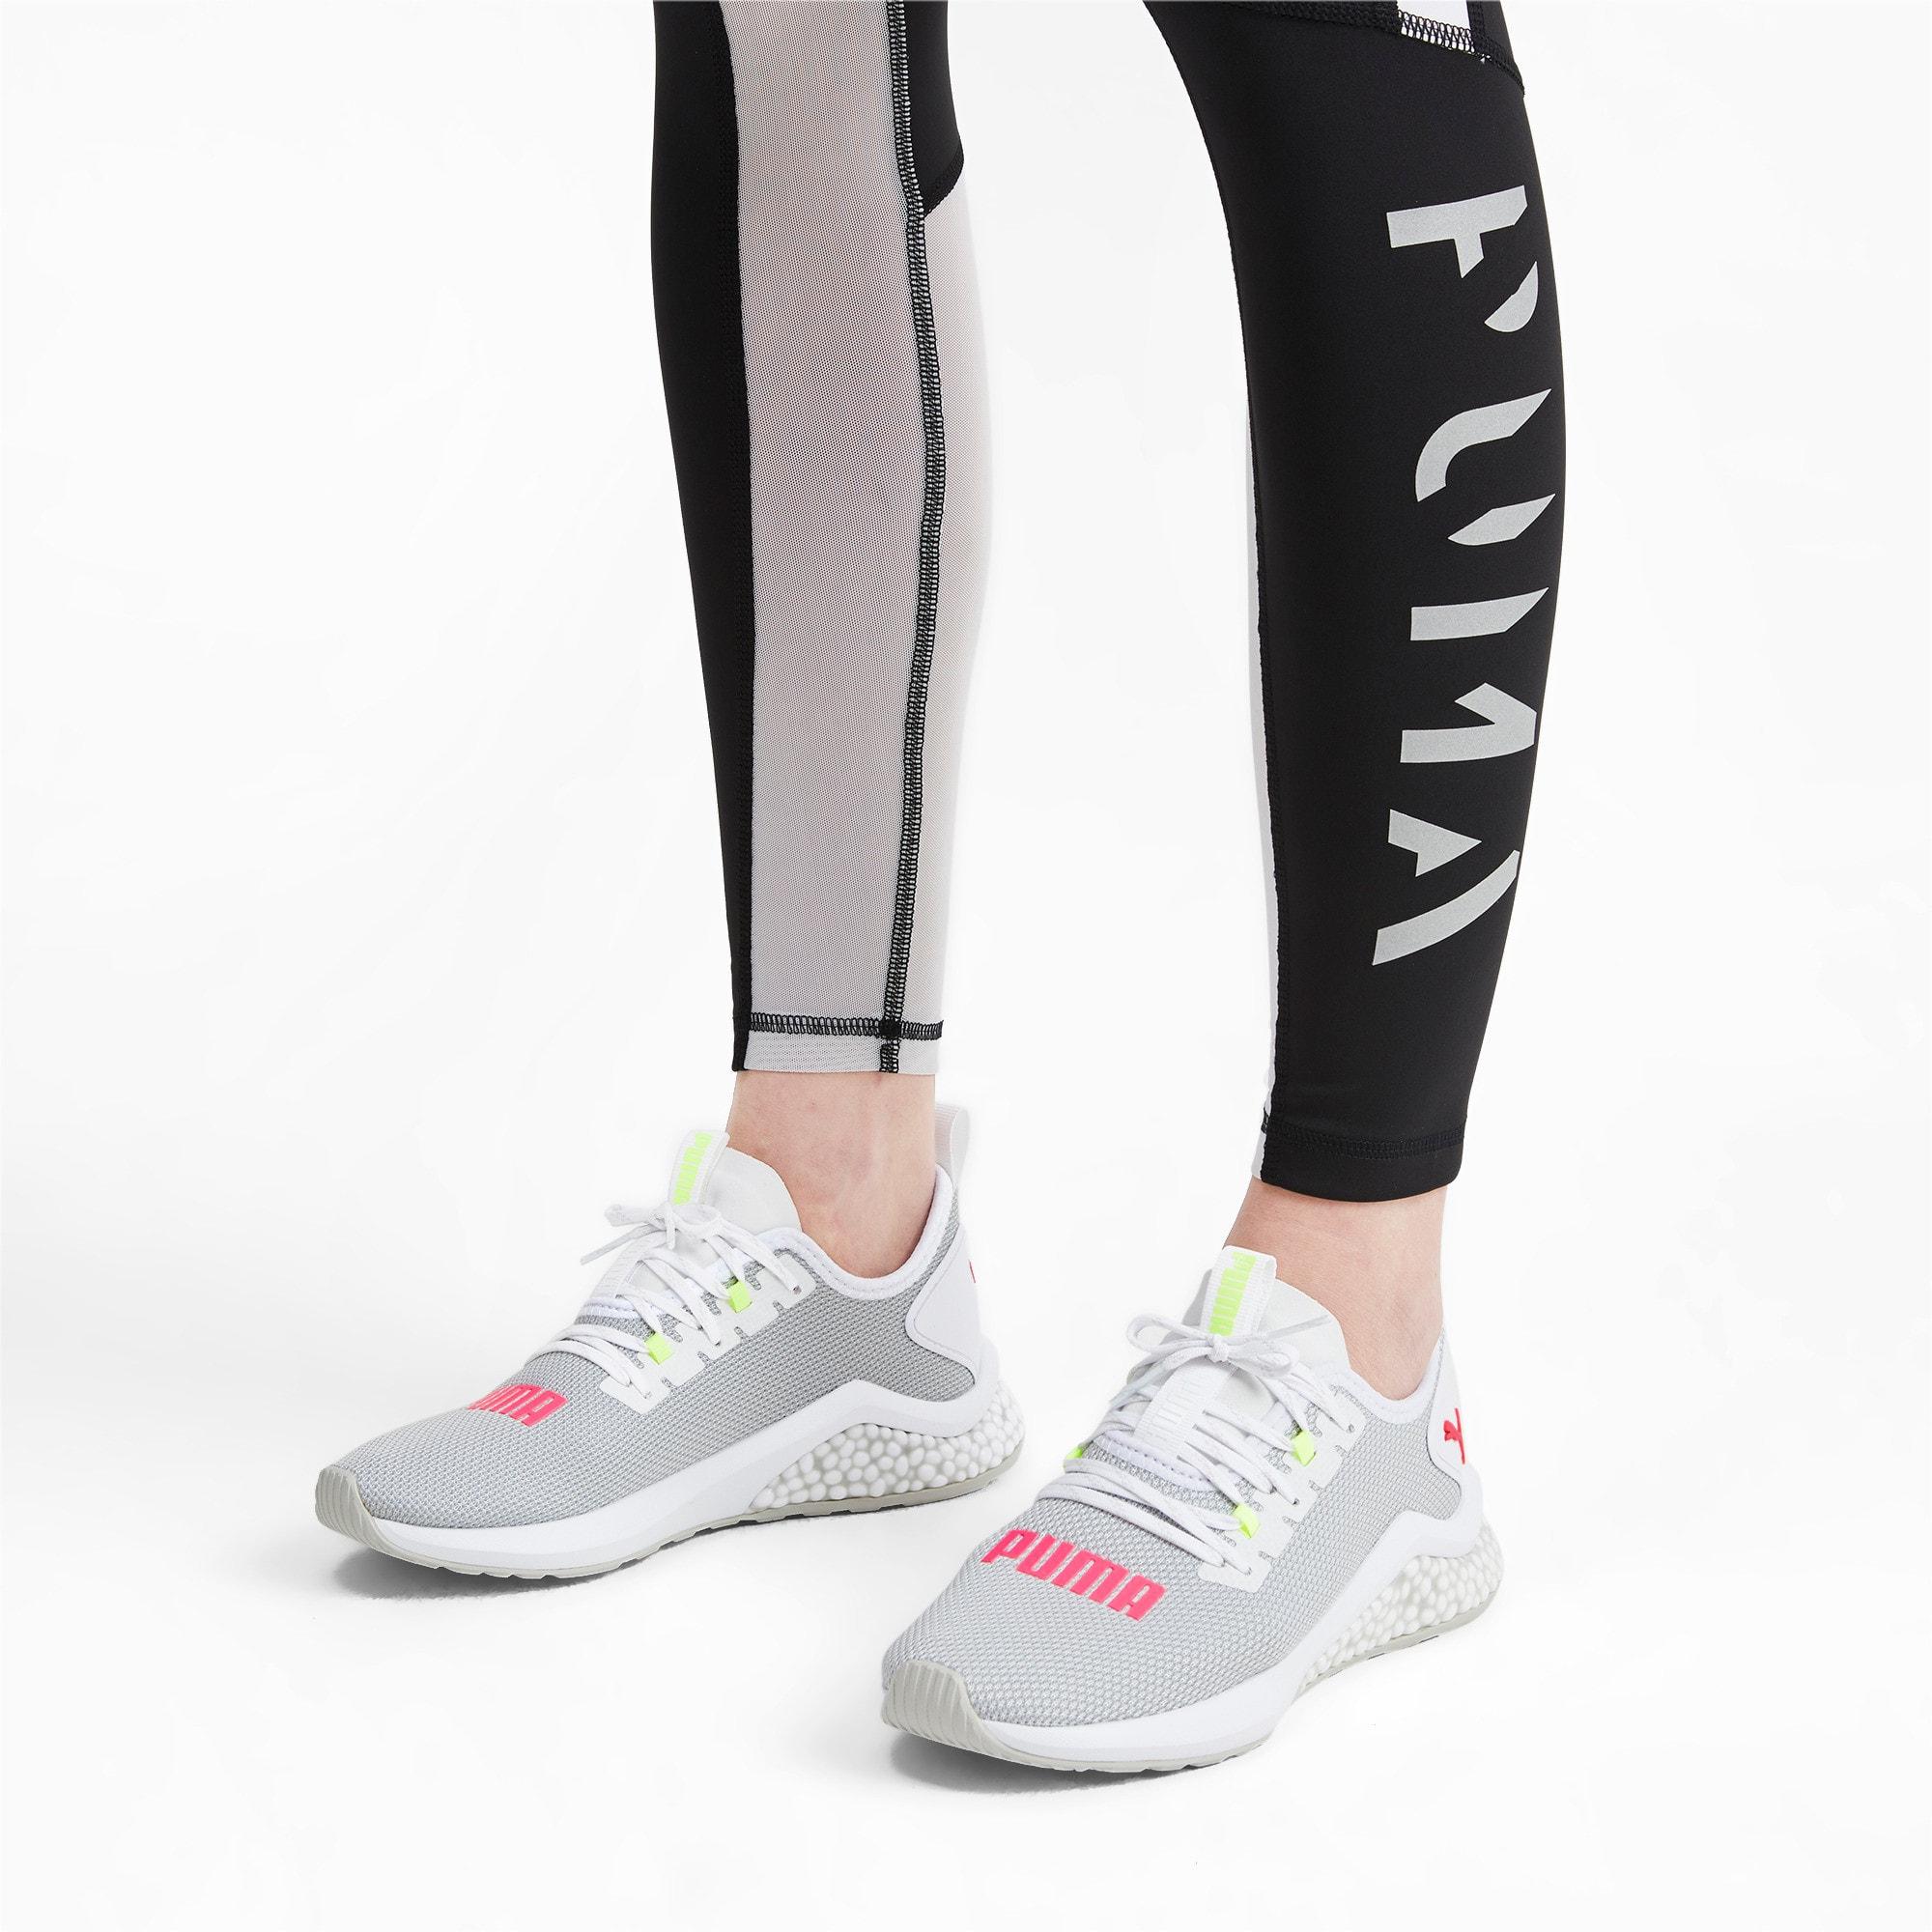 Thumbnail 2 of HYBRID NX Women's Running Shoes, Puma White-Pink Alert, medium